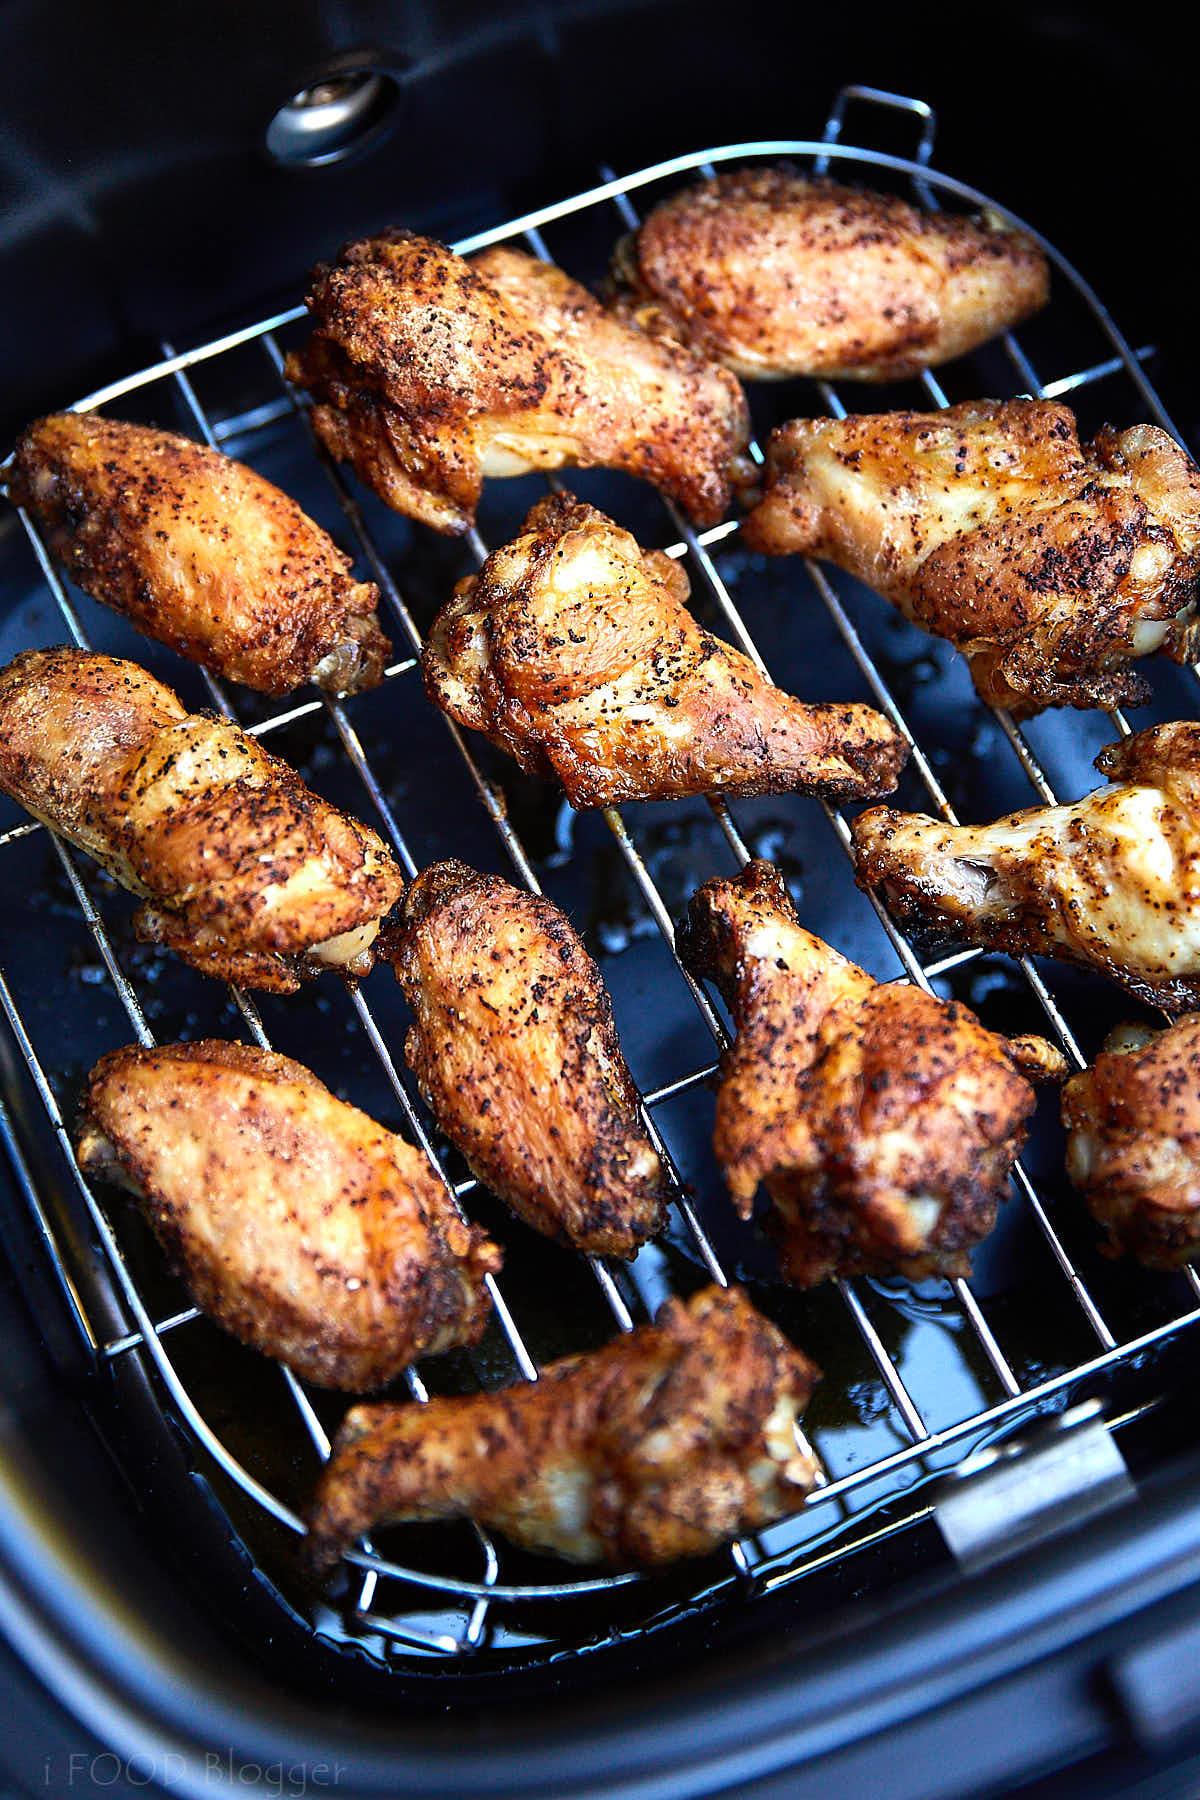 Golden-brown chicken wings on a rack of an air fryer.